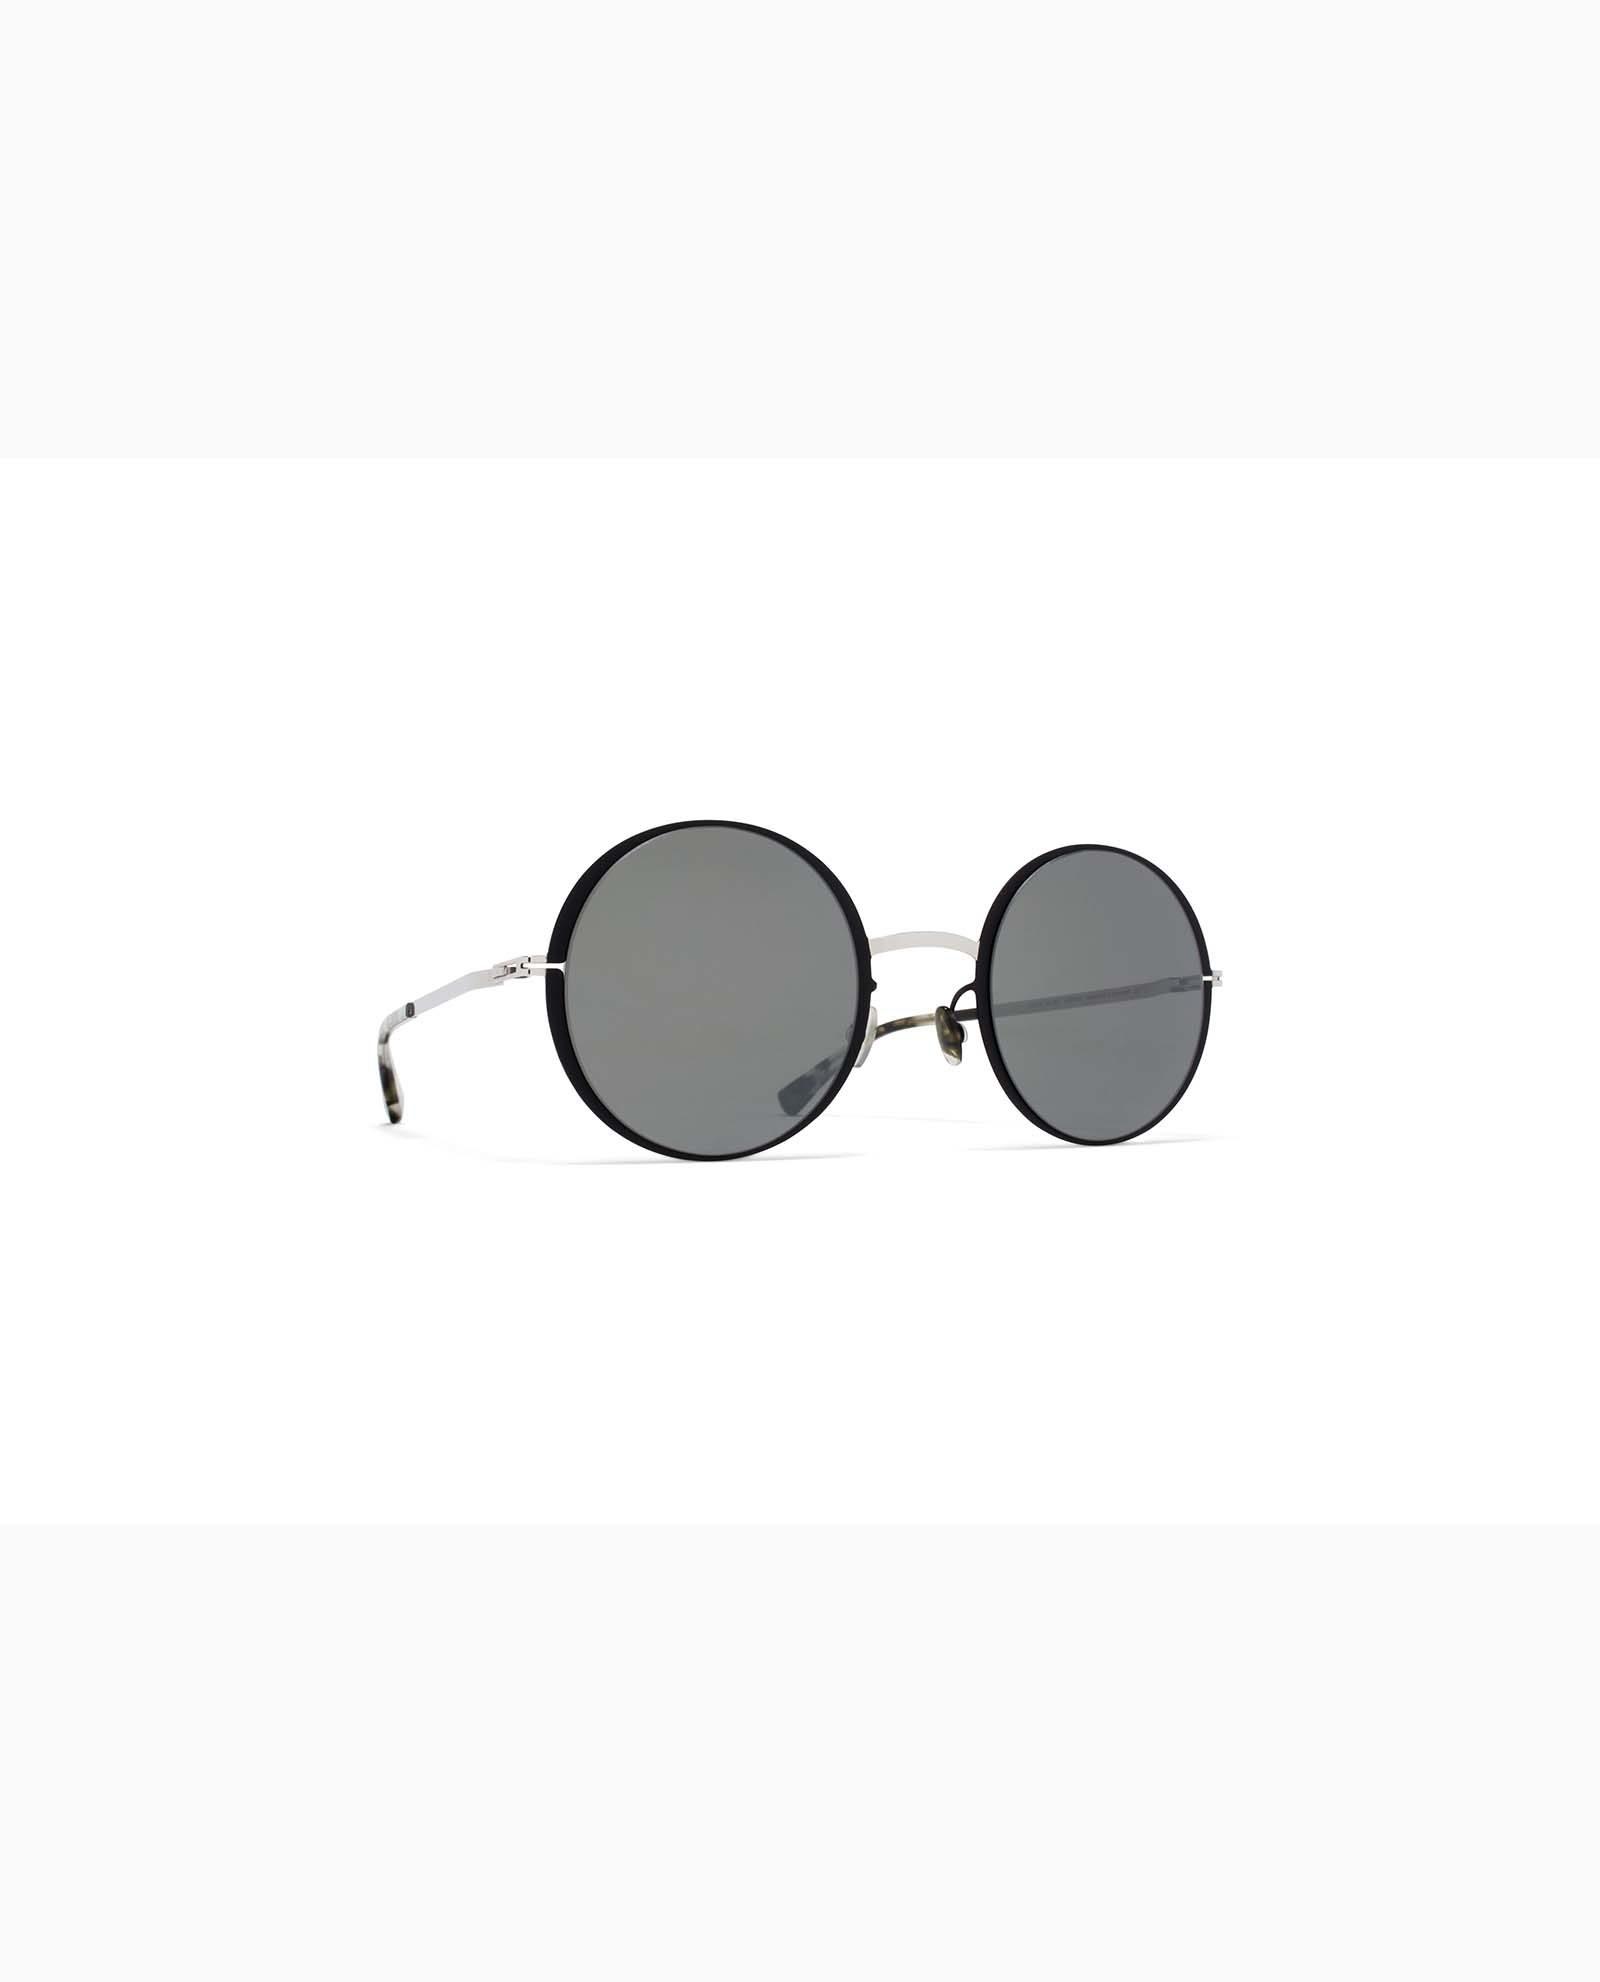 https://www.polydoruoptika.gr/wp-content/uploads/2018/05/mykita-lite-acetate-sun-joona-silver-black-mirror-woman.jpg